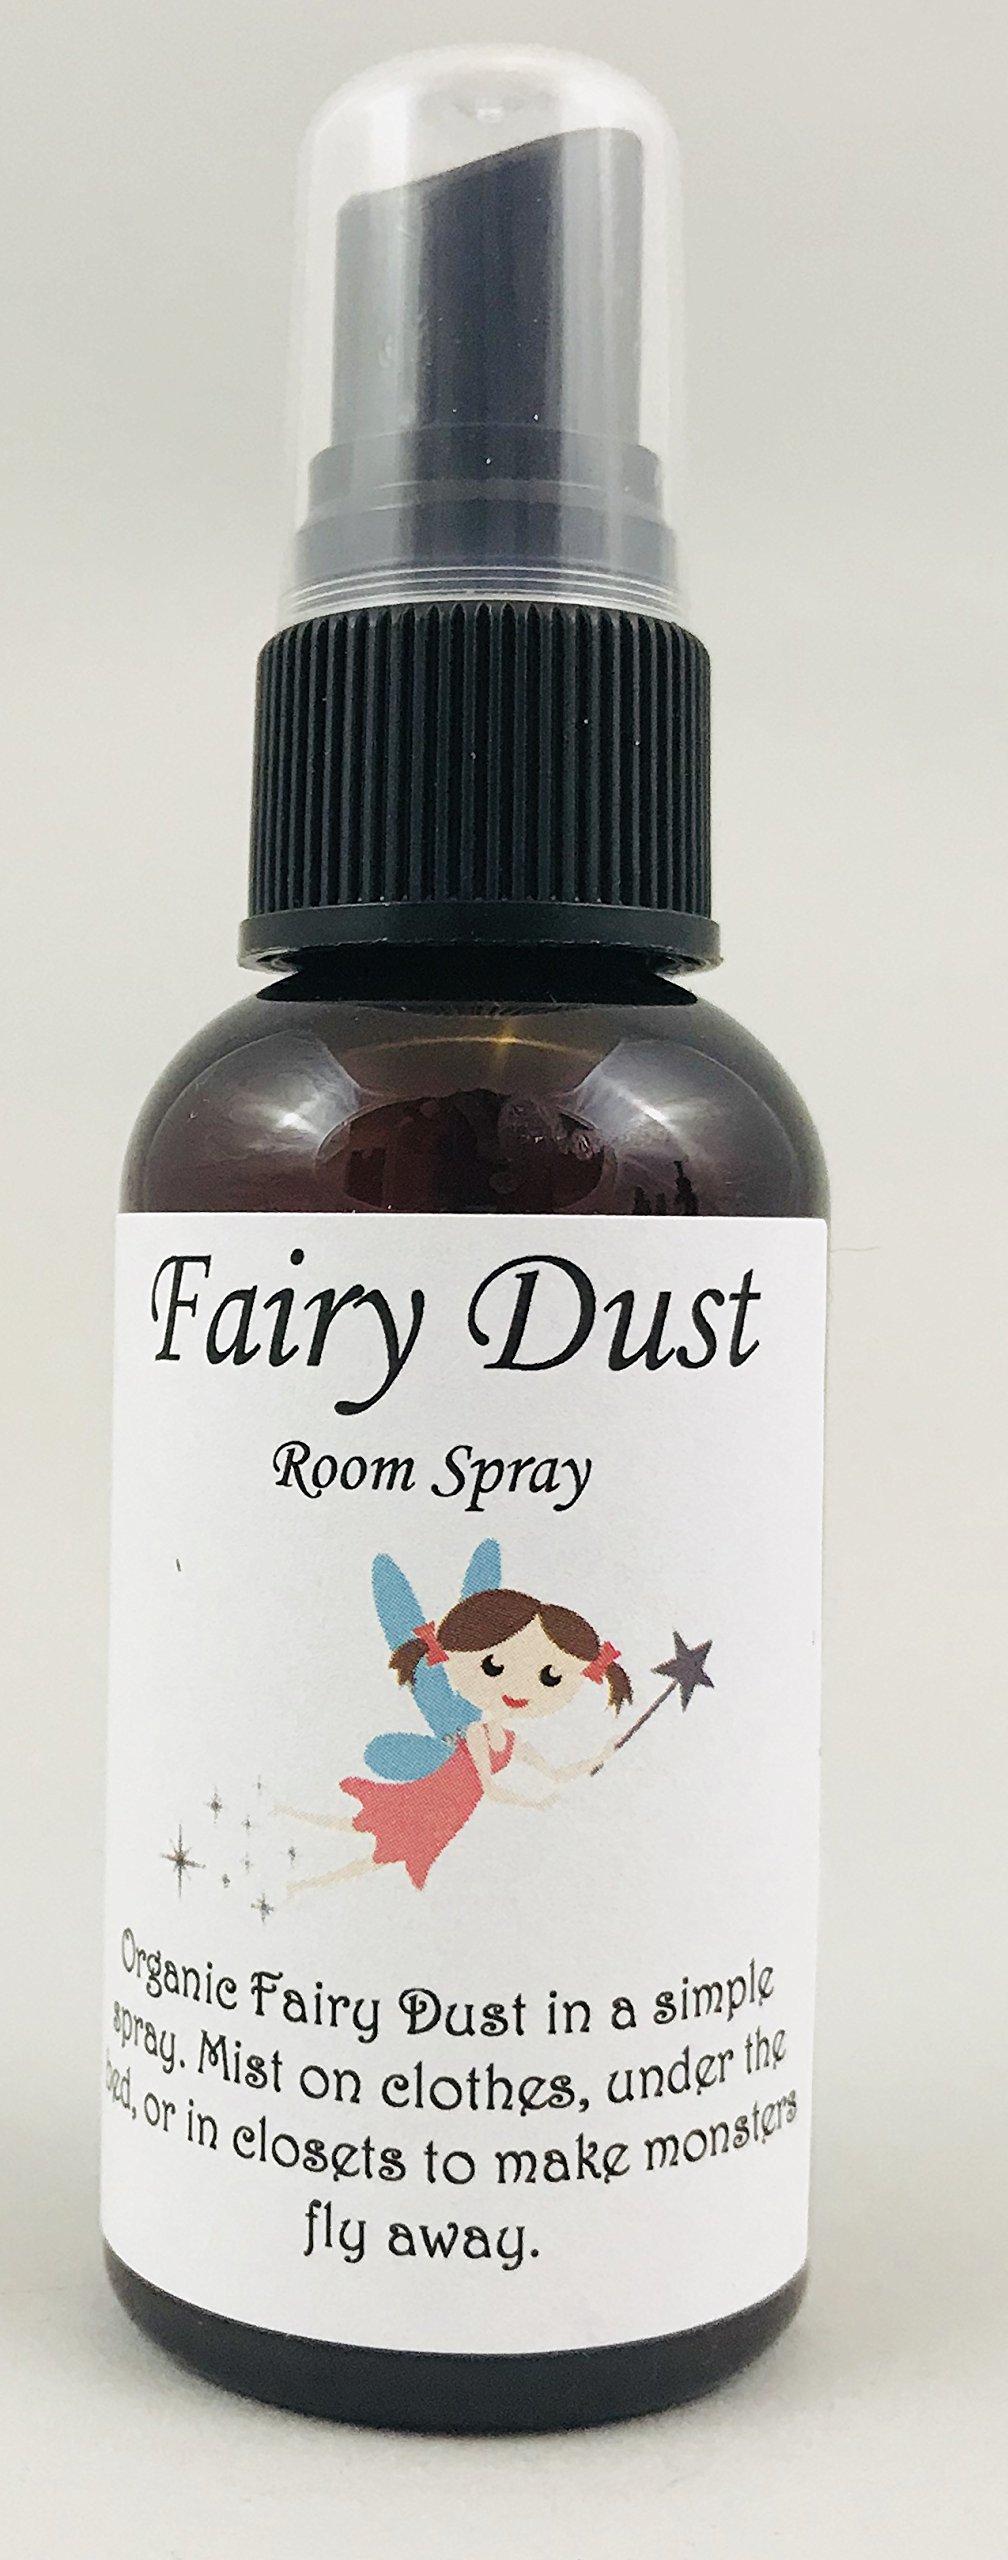 La Pixie Wellness Monster Spray Fairy Dust, Kids Room Spray-Organic Pure Essential Oils,Fairy Dust Room Spray, Keep Monsters Away, Lavender Essential Oil, Gift for Kids, Bedtime Story, 2 oz